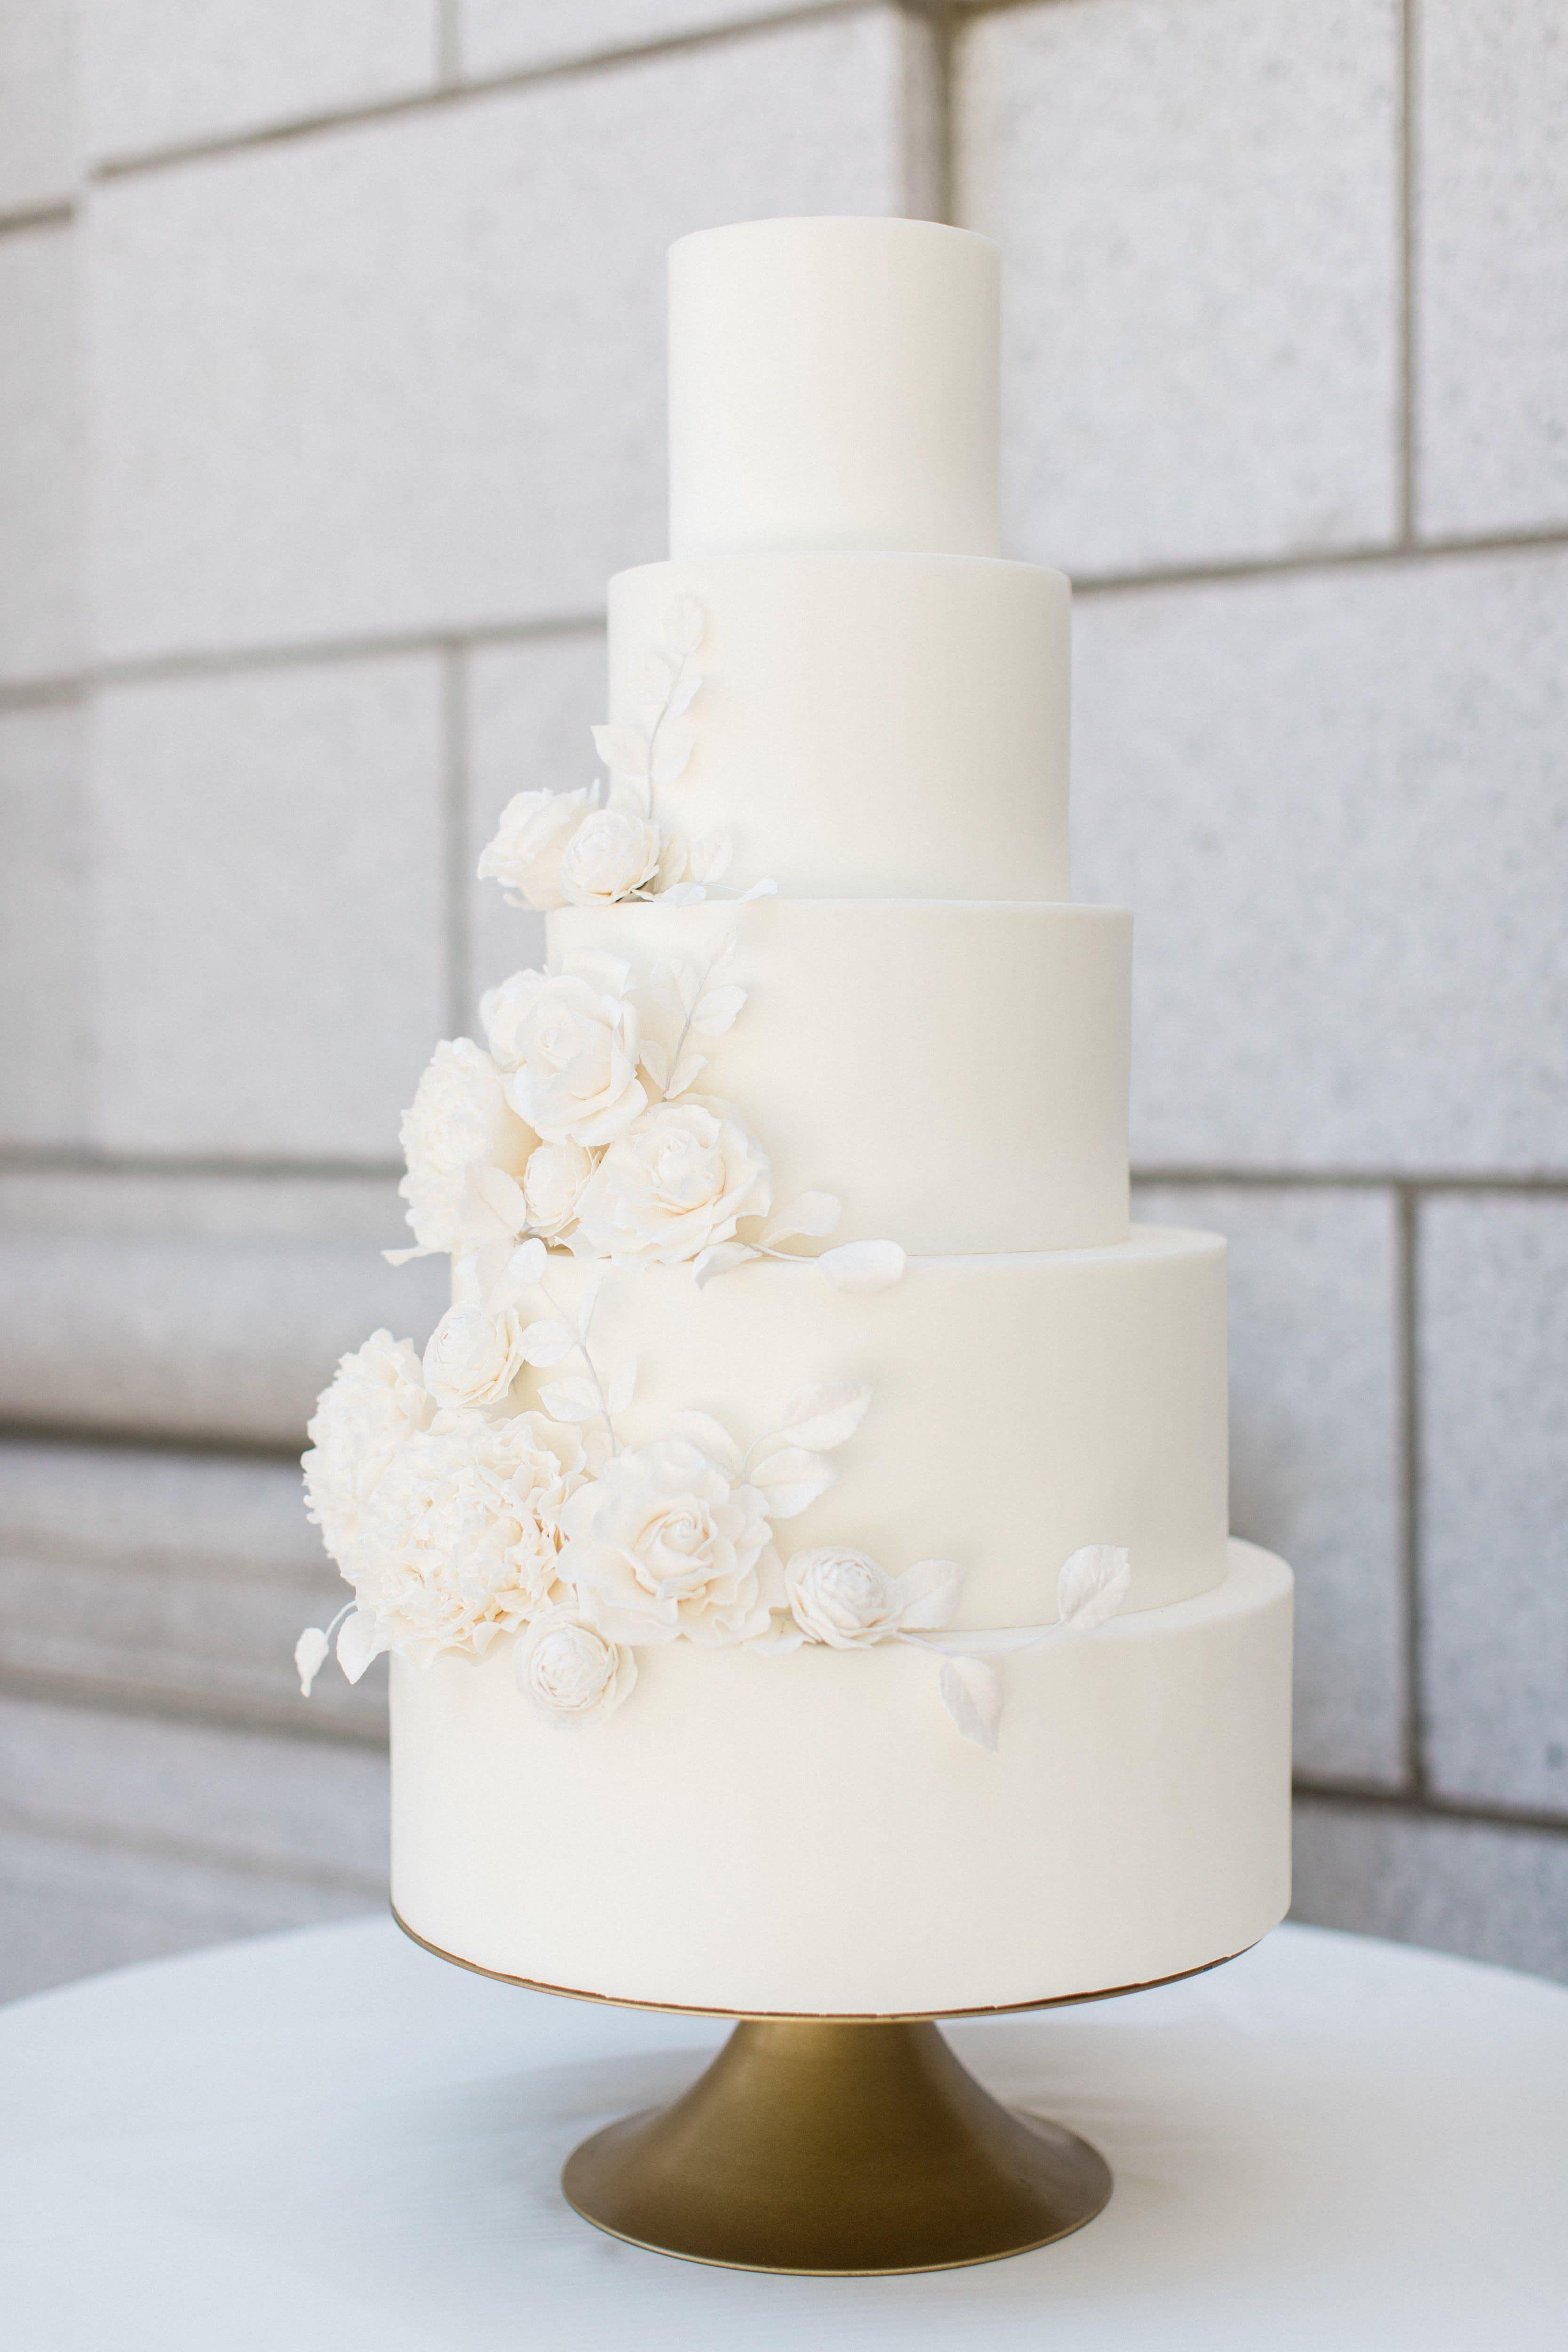 White Sugar Flower Wedding Cake Classic Wedding Cake Timeless Wedding Cake Flo Sugar Flower Wedding Cake Classic Wedding Cake Wedding Cakes With Cupcakes